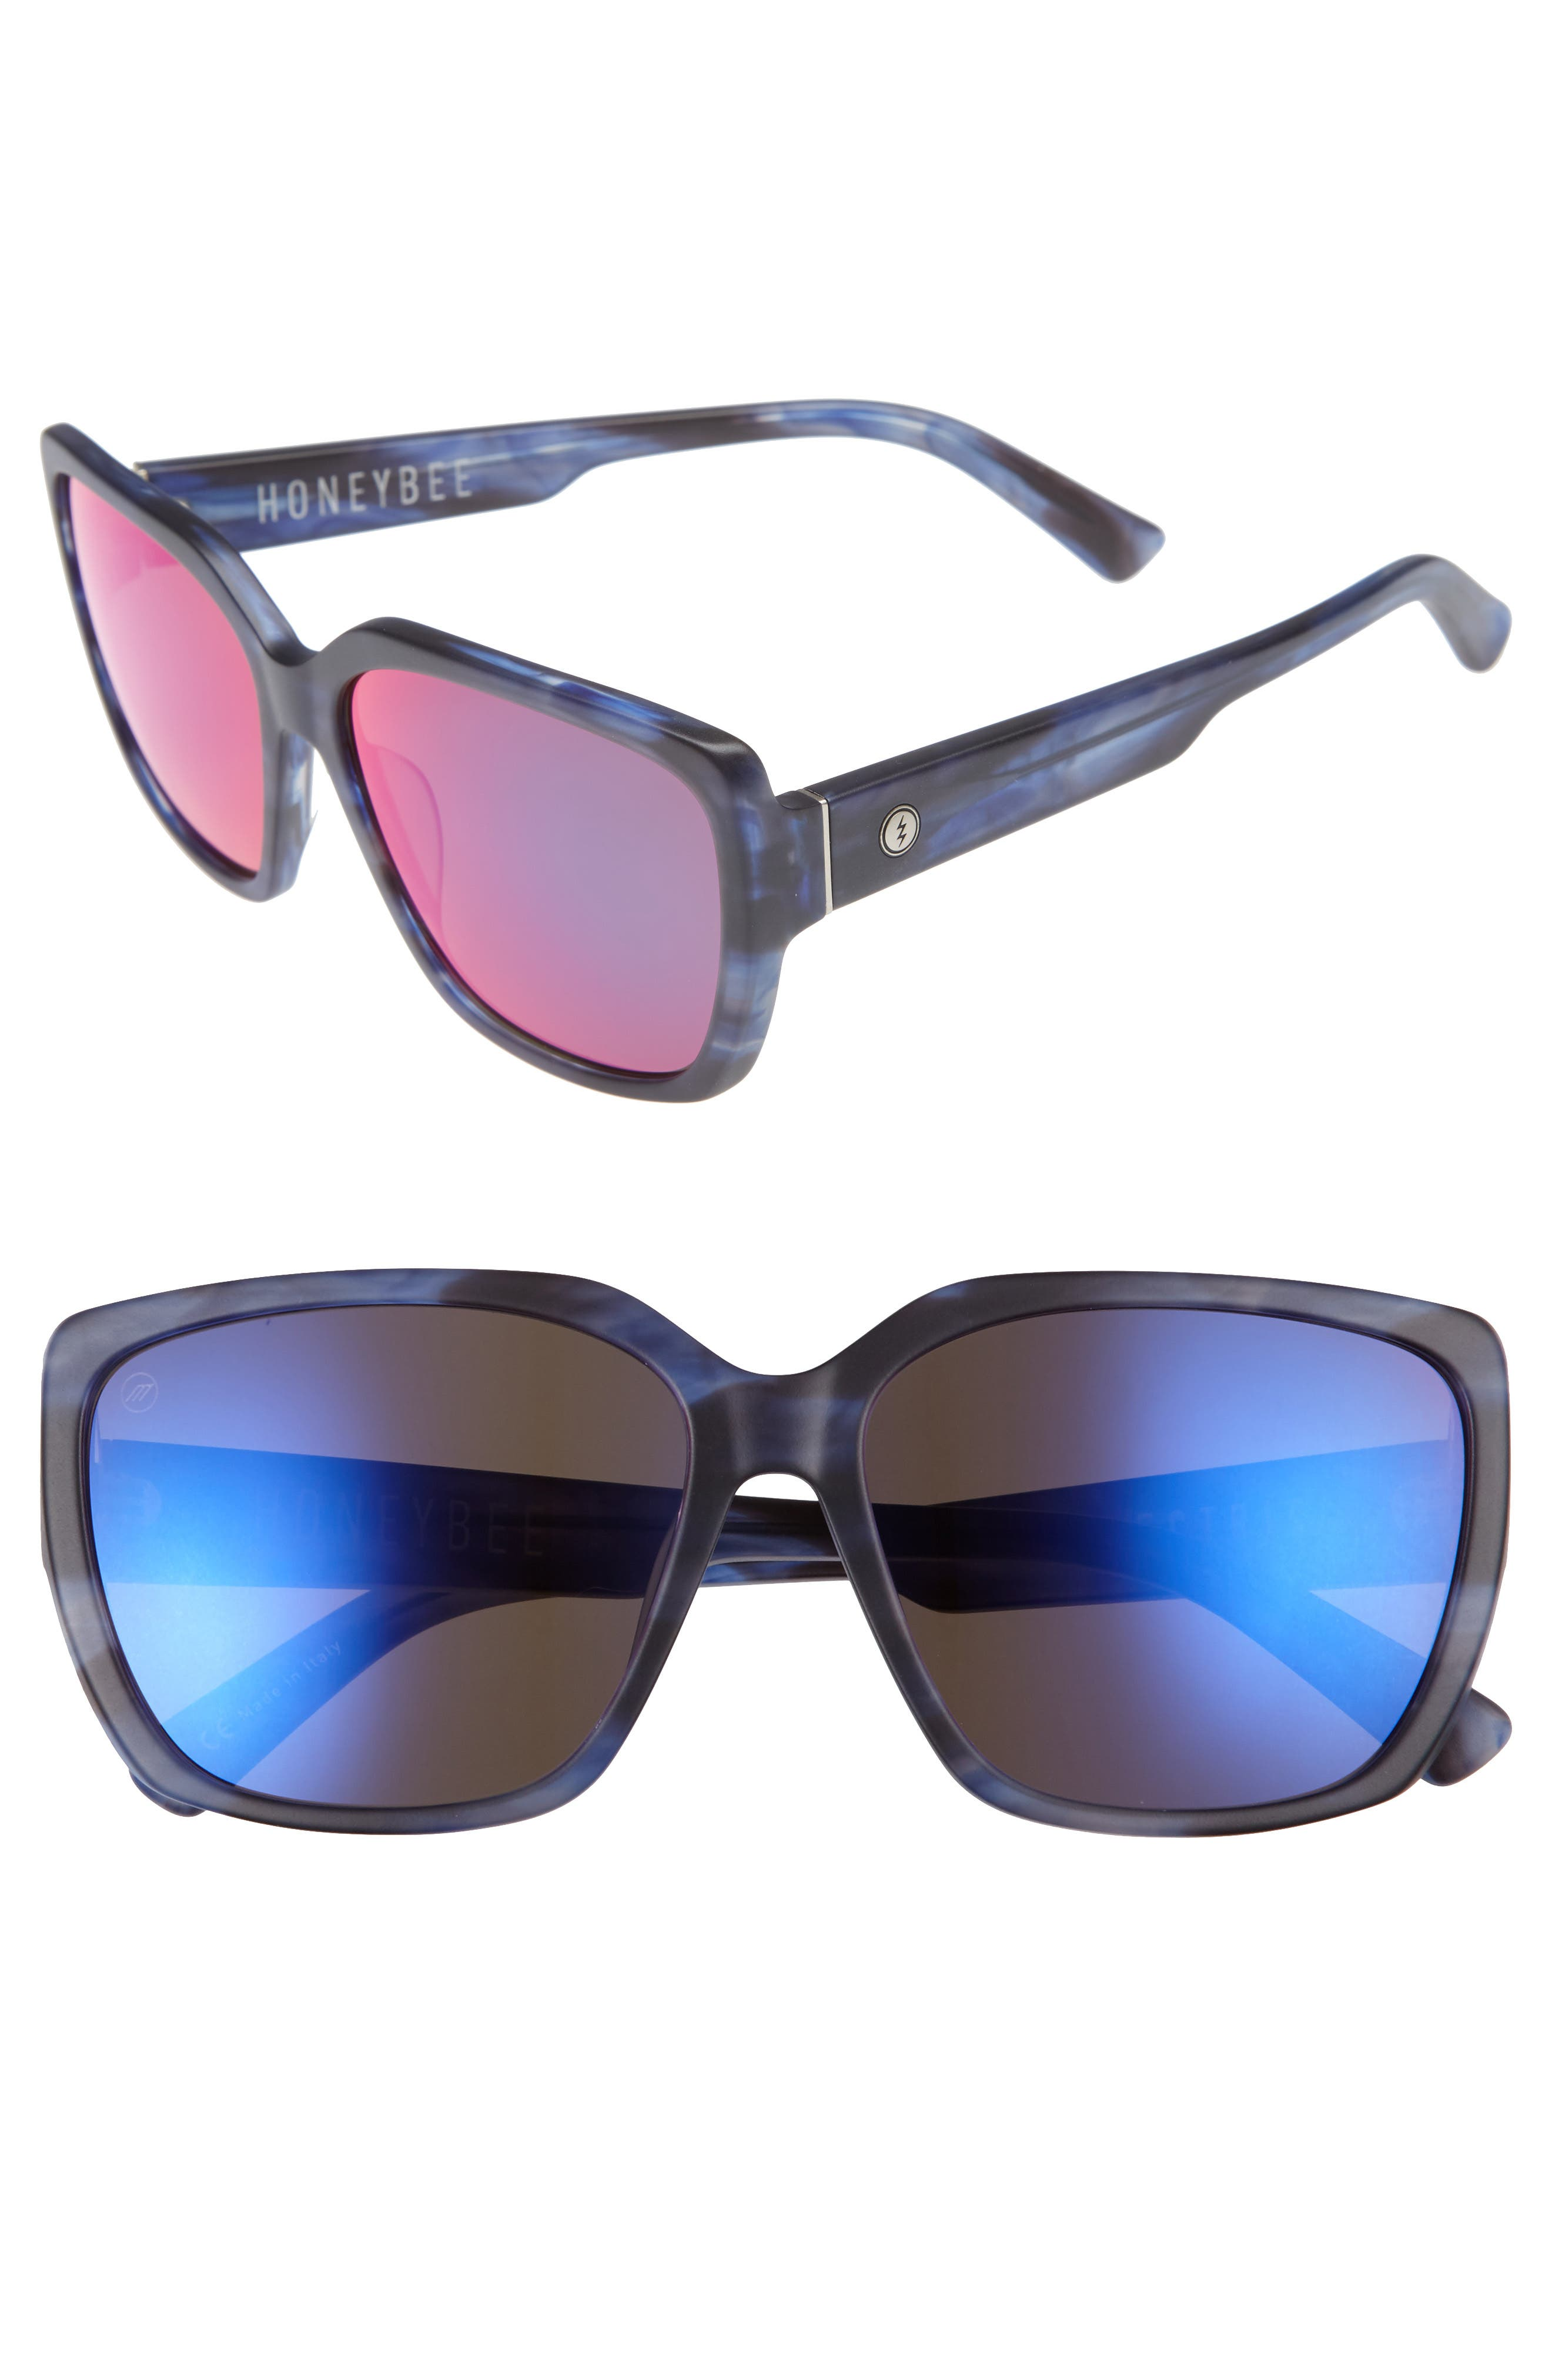 Electric Honey Bee 60mm Mirrored Sunglasses